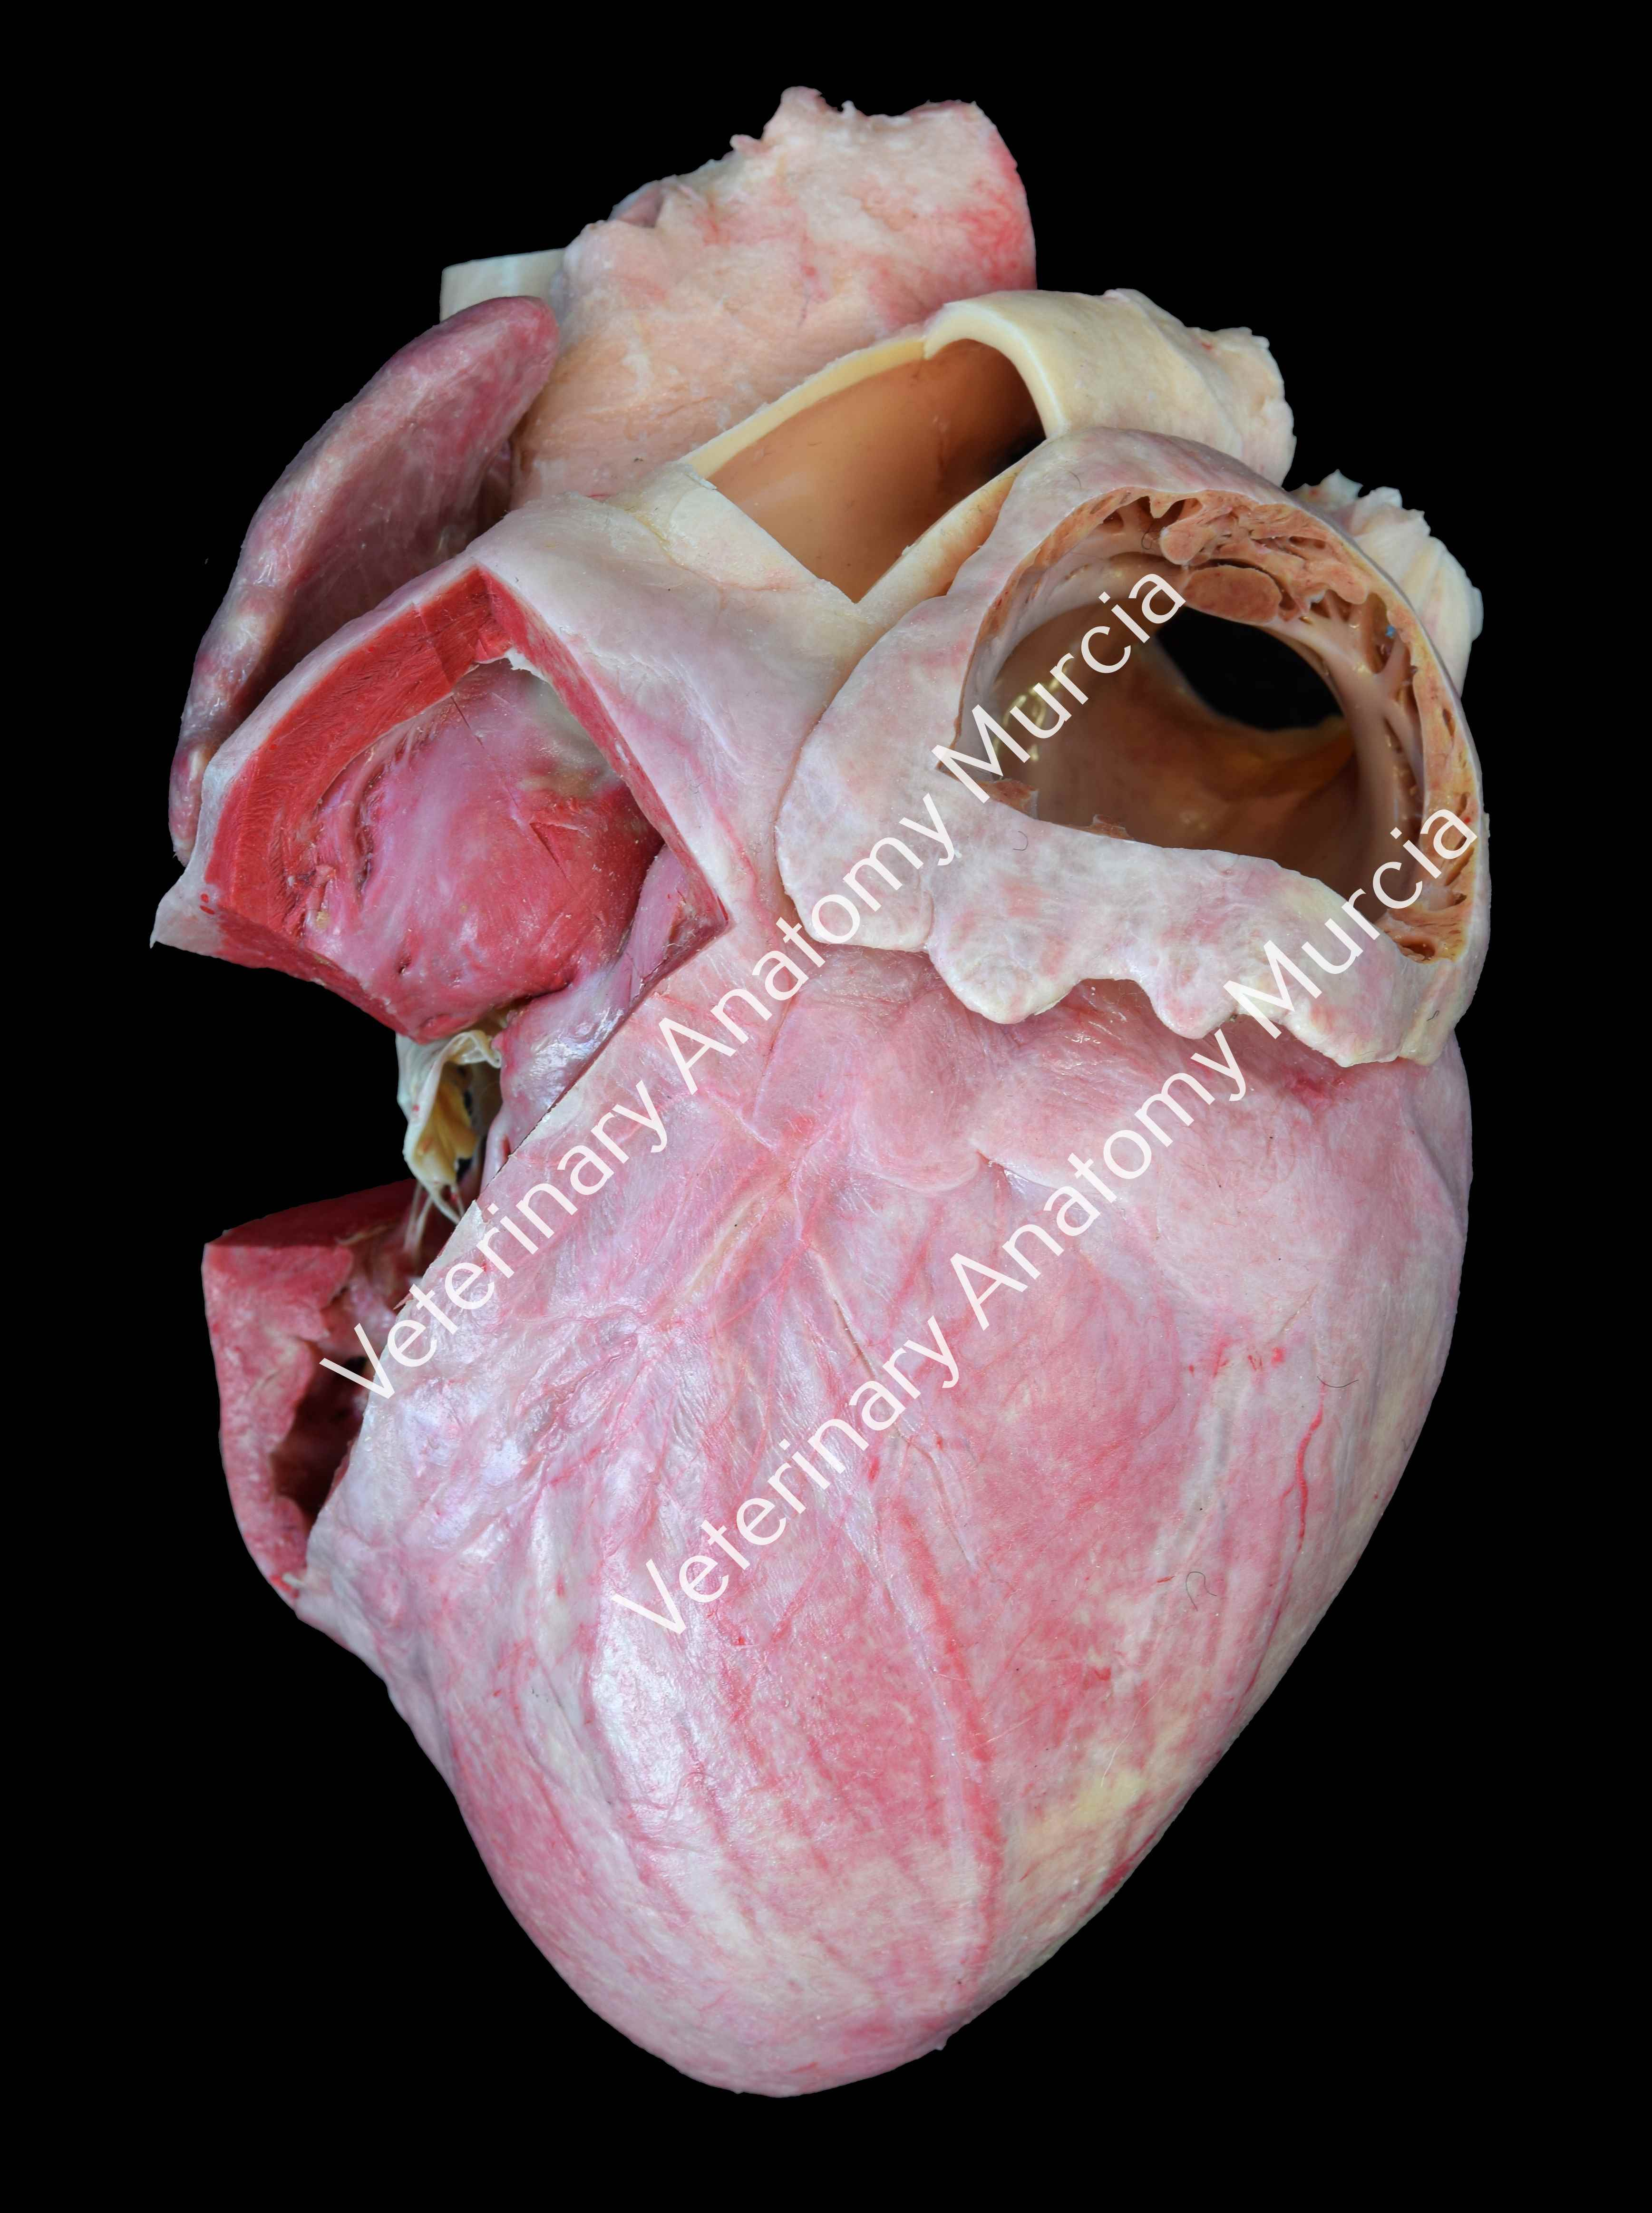 corazón-cerdo-inyectado-cara-izq-m.jpg